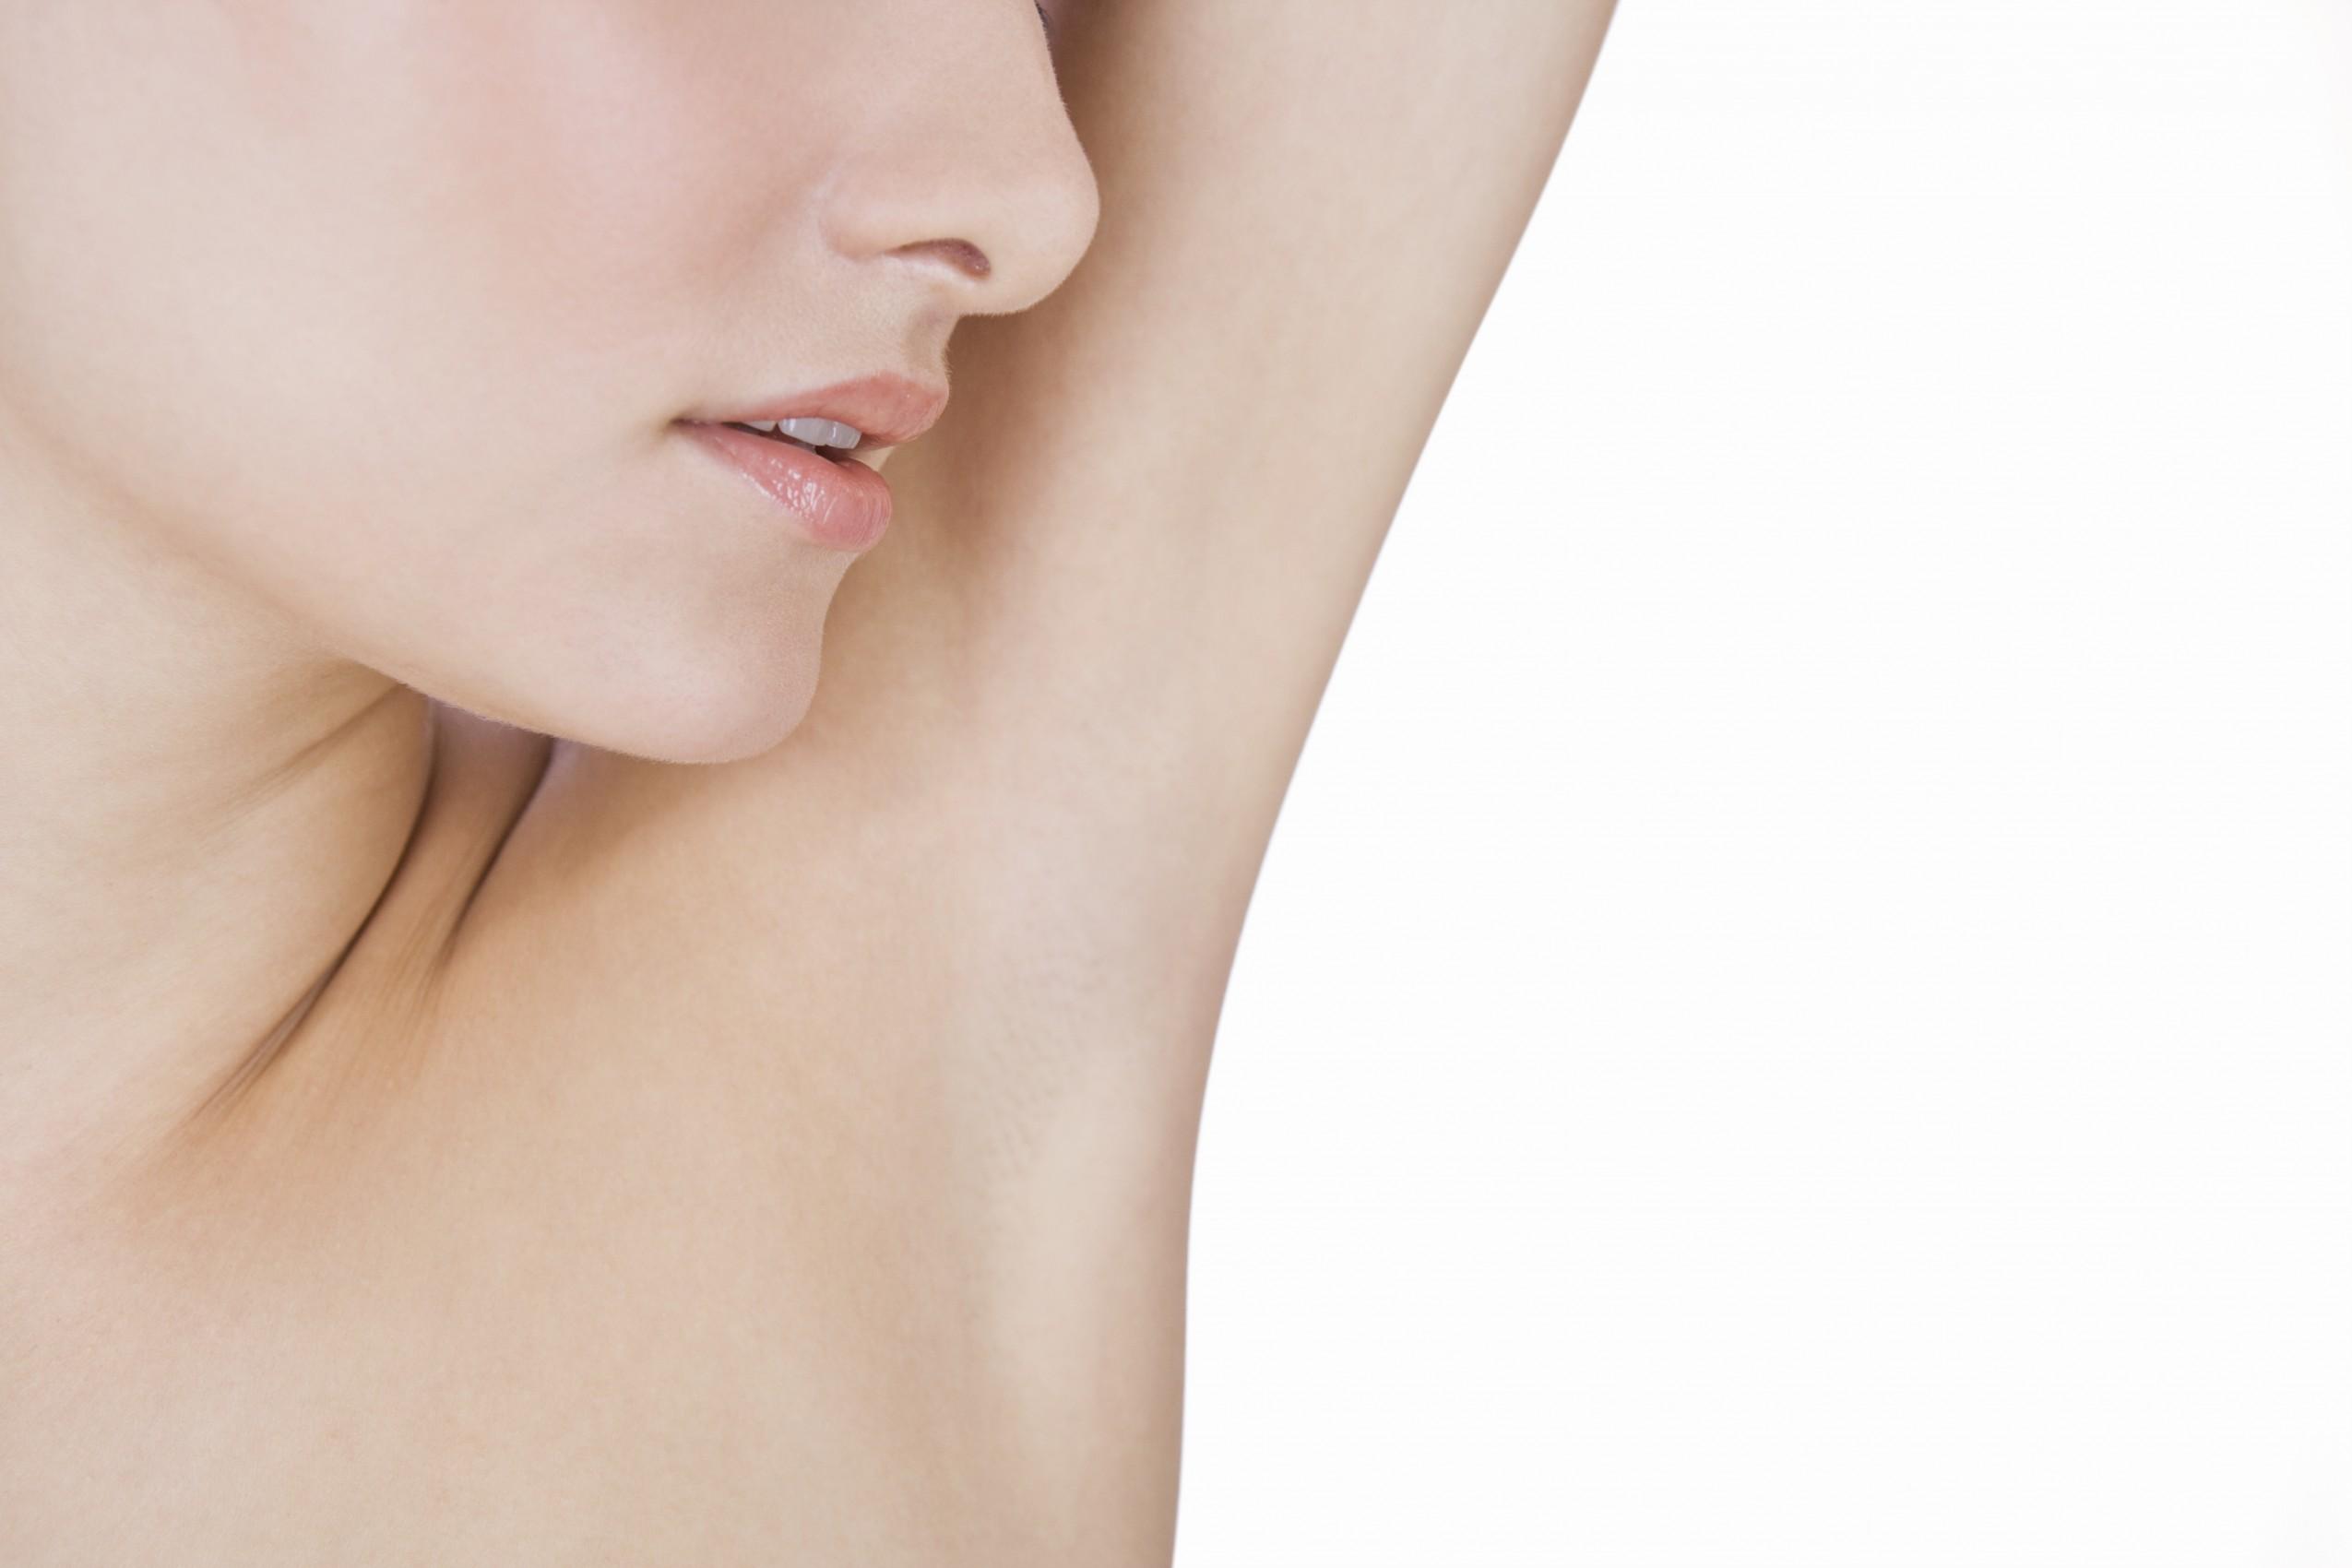 Young woman's armpit, close-up